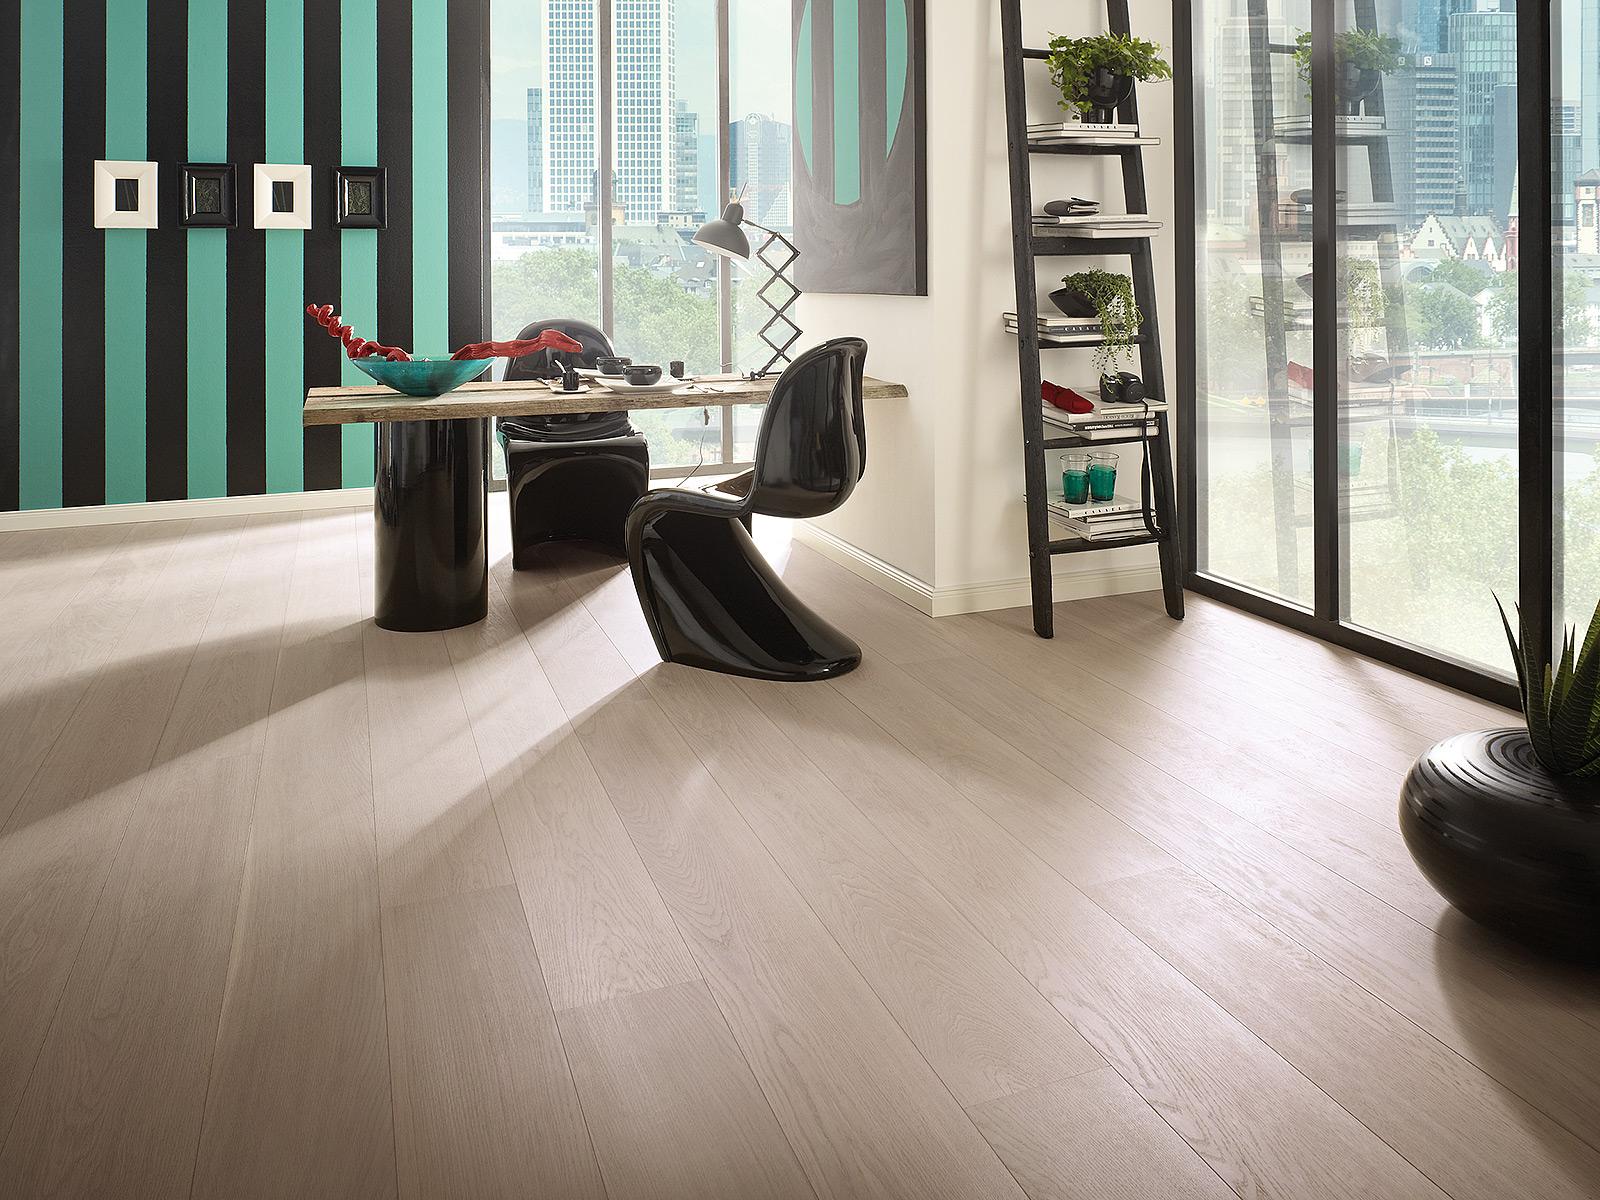 parkett und parkettboden kristian s bodenbel ge bad s ckingen. Black Bedroom Furniture Sets. Home Design Ideas